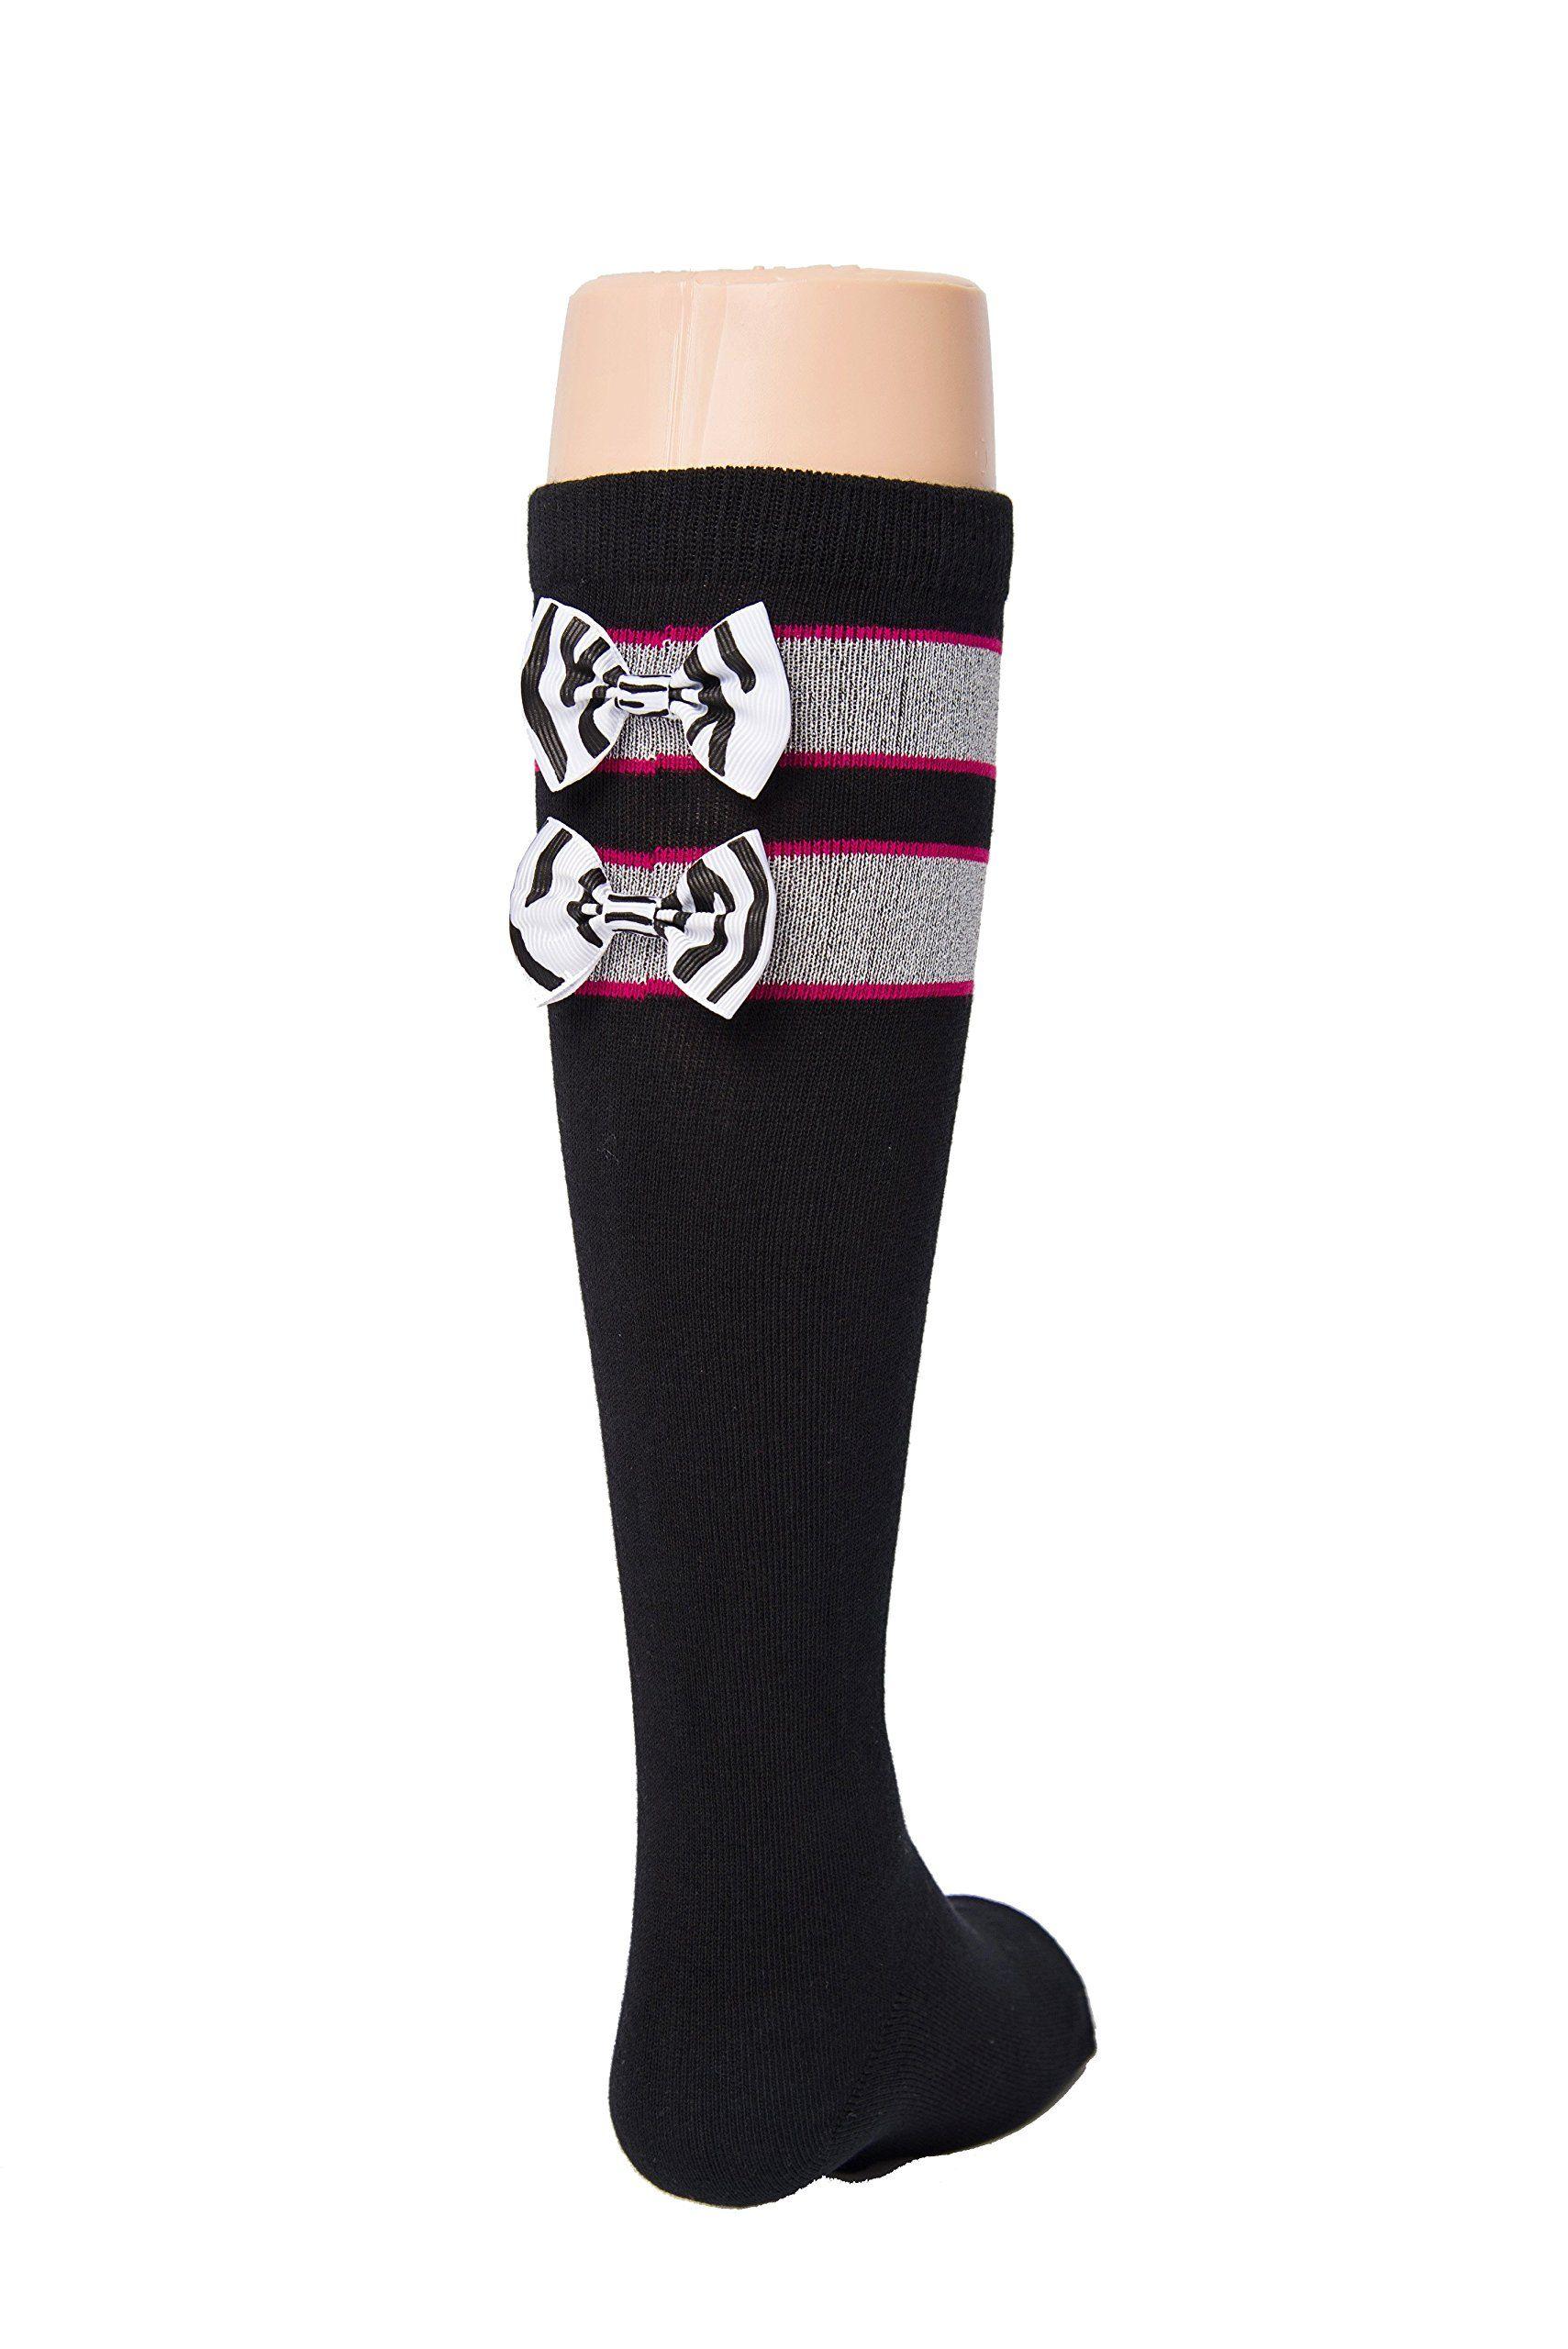 Black Tot Jocks Girls Sports Socks Pink Black And Silver With Zebra Print Bow Kids Size 9 2 5 Soccer Volleyball Field Sport Socks Sport Girl Softball Socks